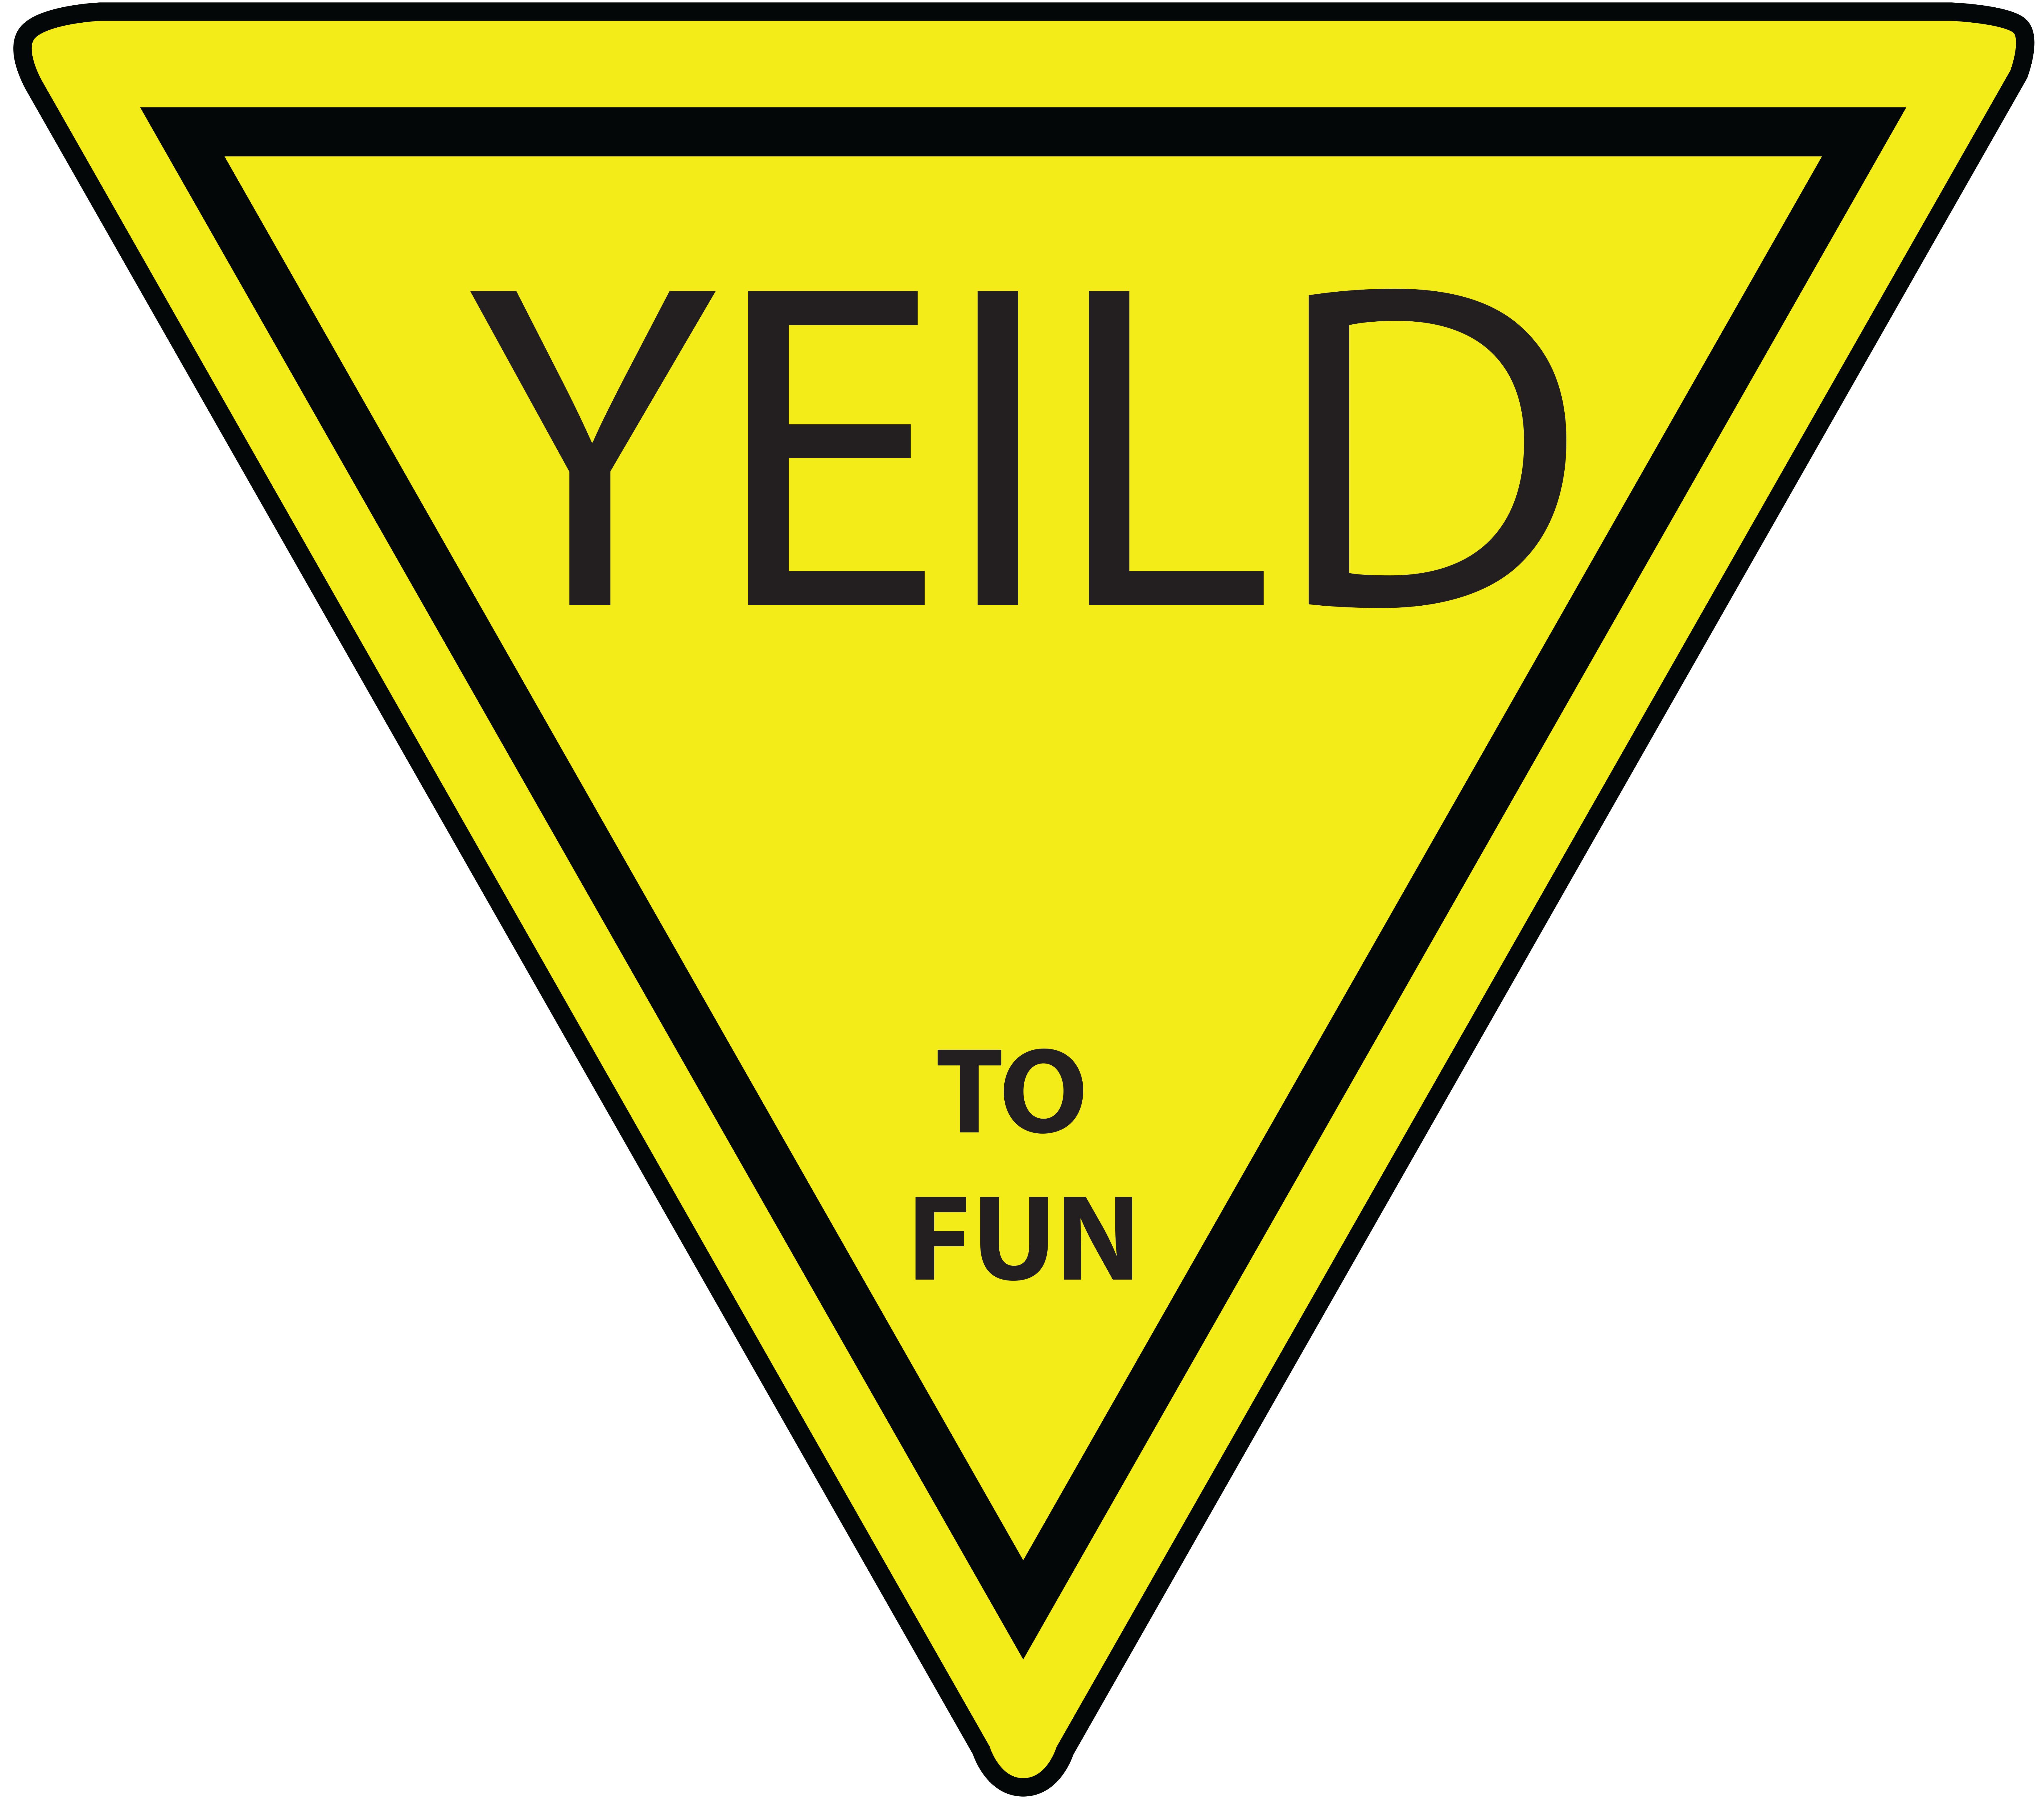 yield signs clip art viewing clipart panda free clipart images rh clipartpanda com  yield sign clip art free